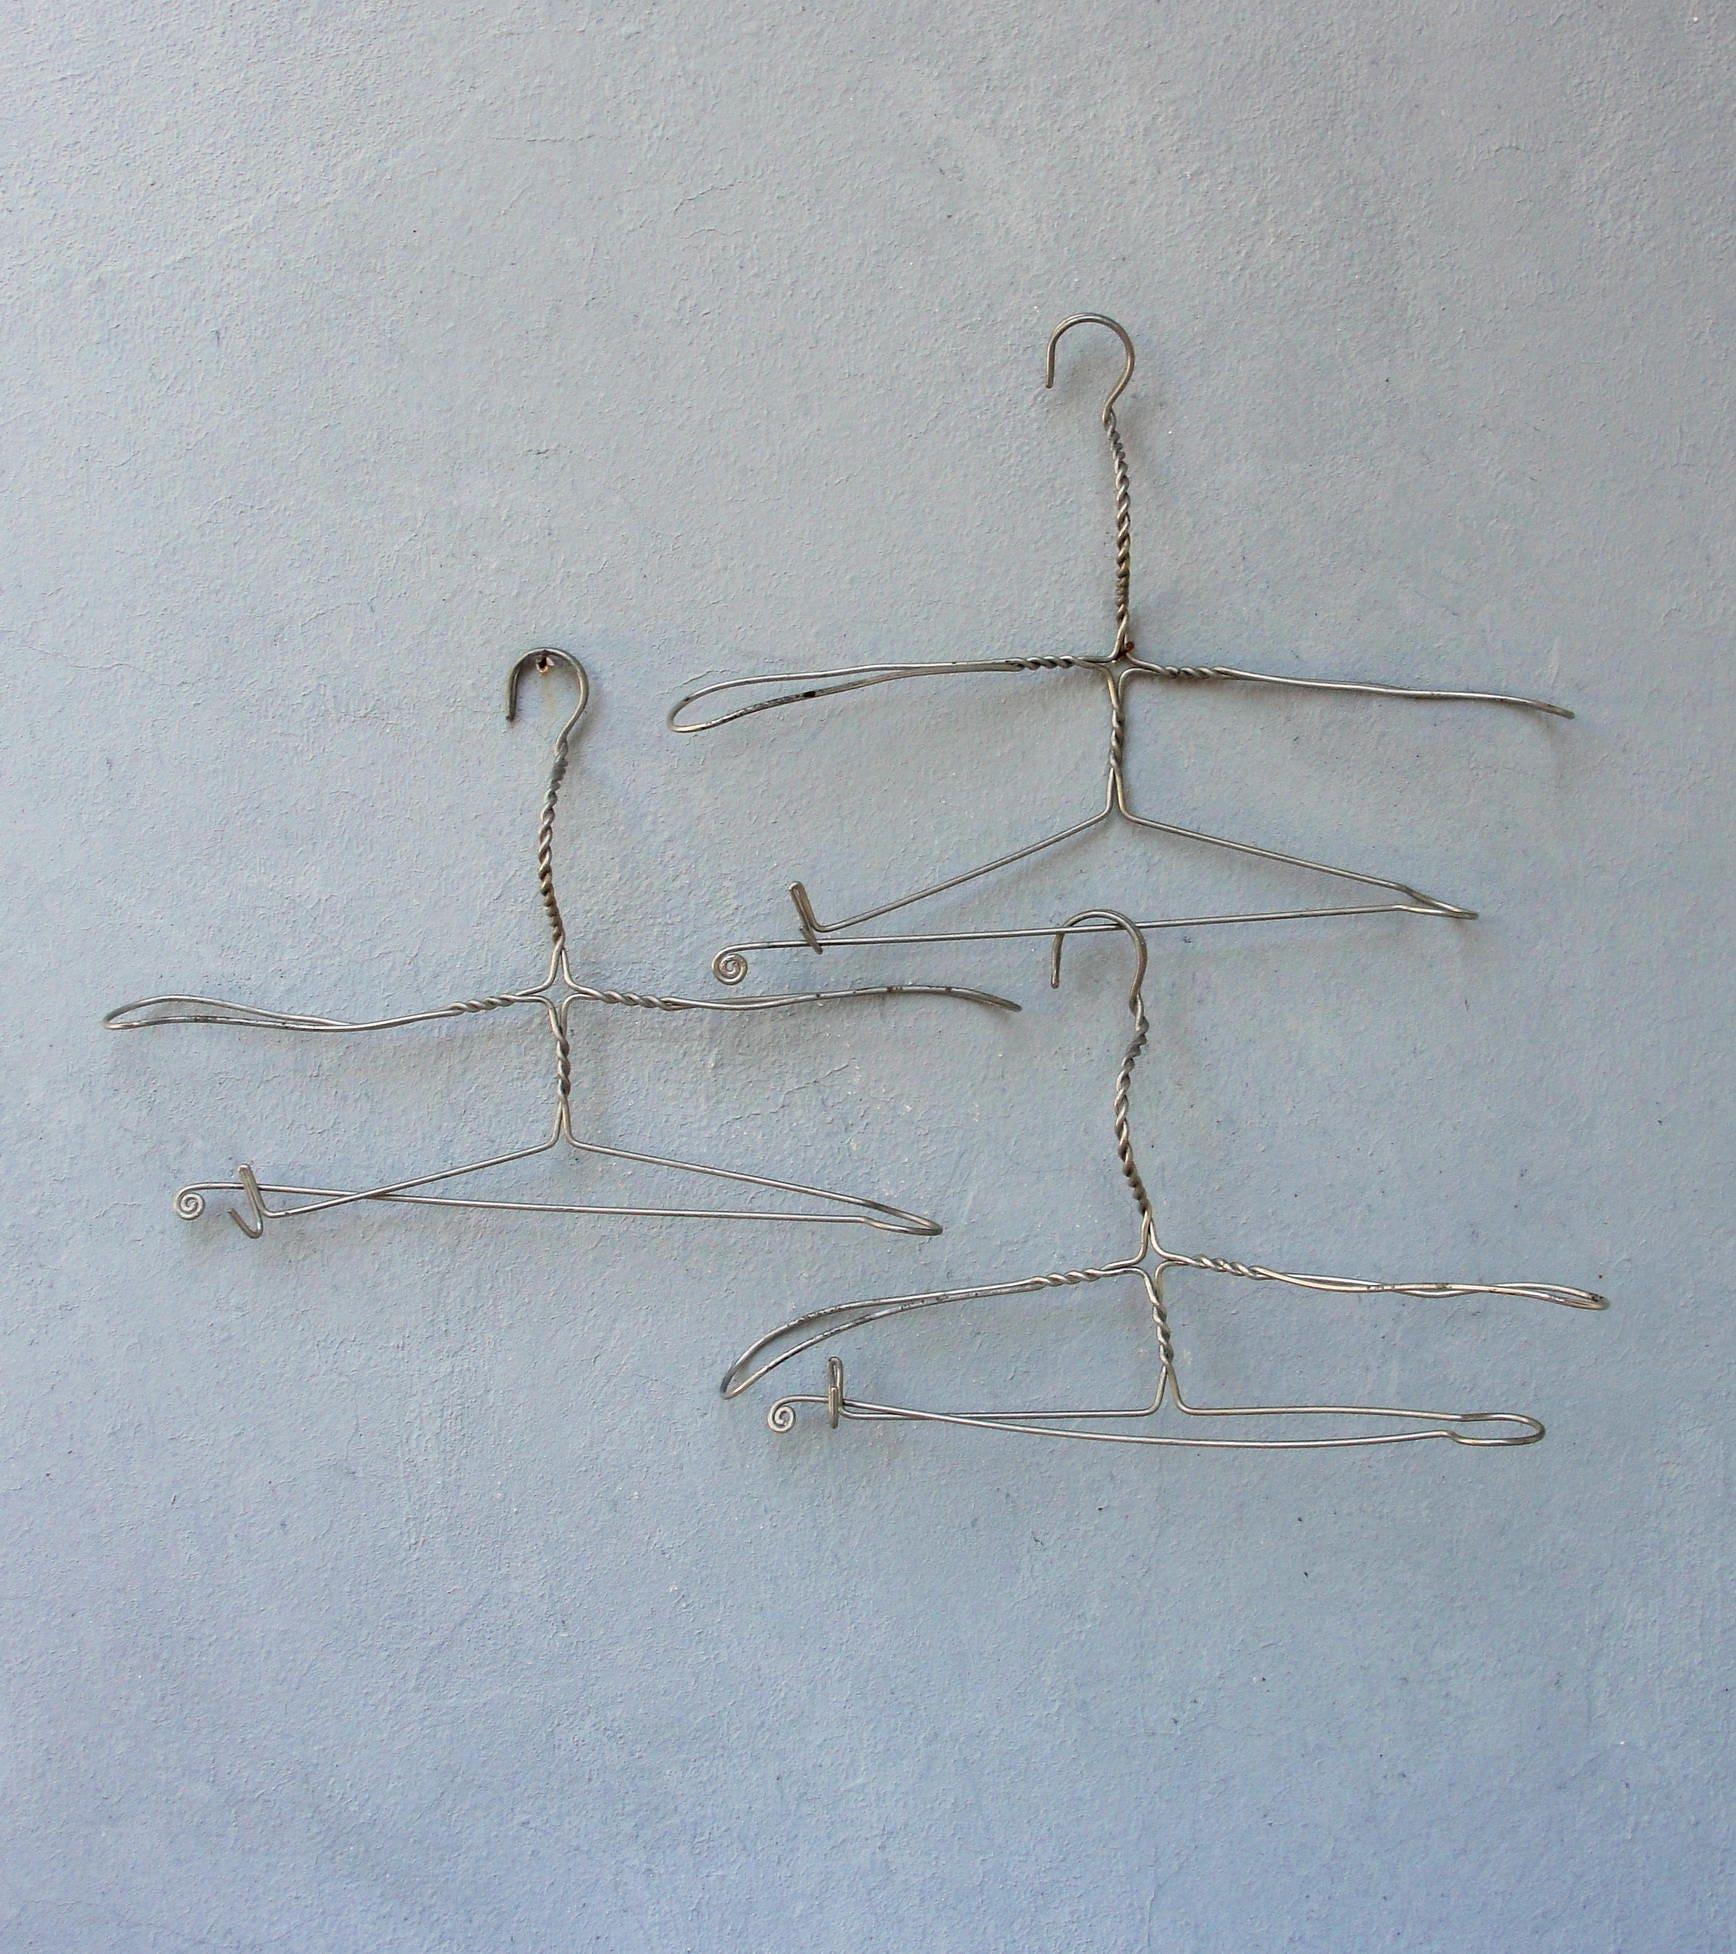 Antike Draht Kleiderbügel Vintage schwere starke